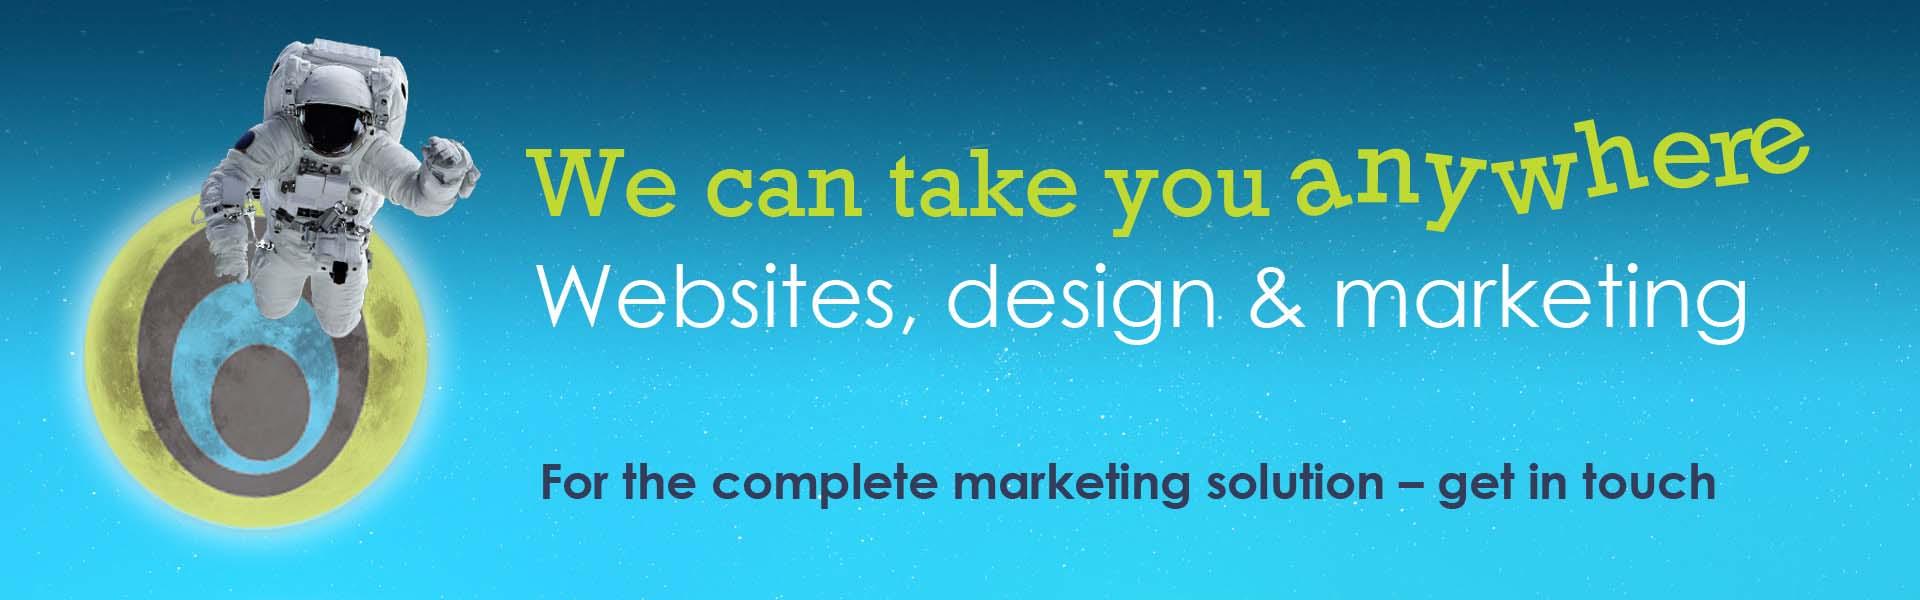 Website design Hertfordshire, marketing agency, marketing agencies in Hertfordshire